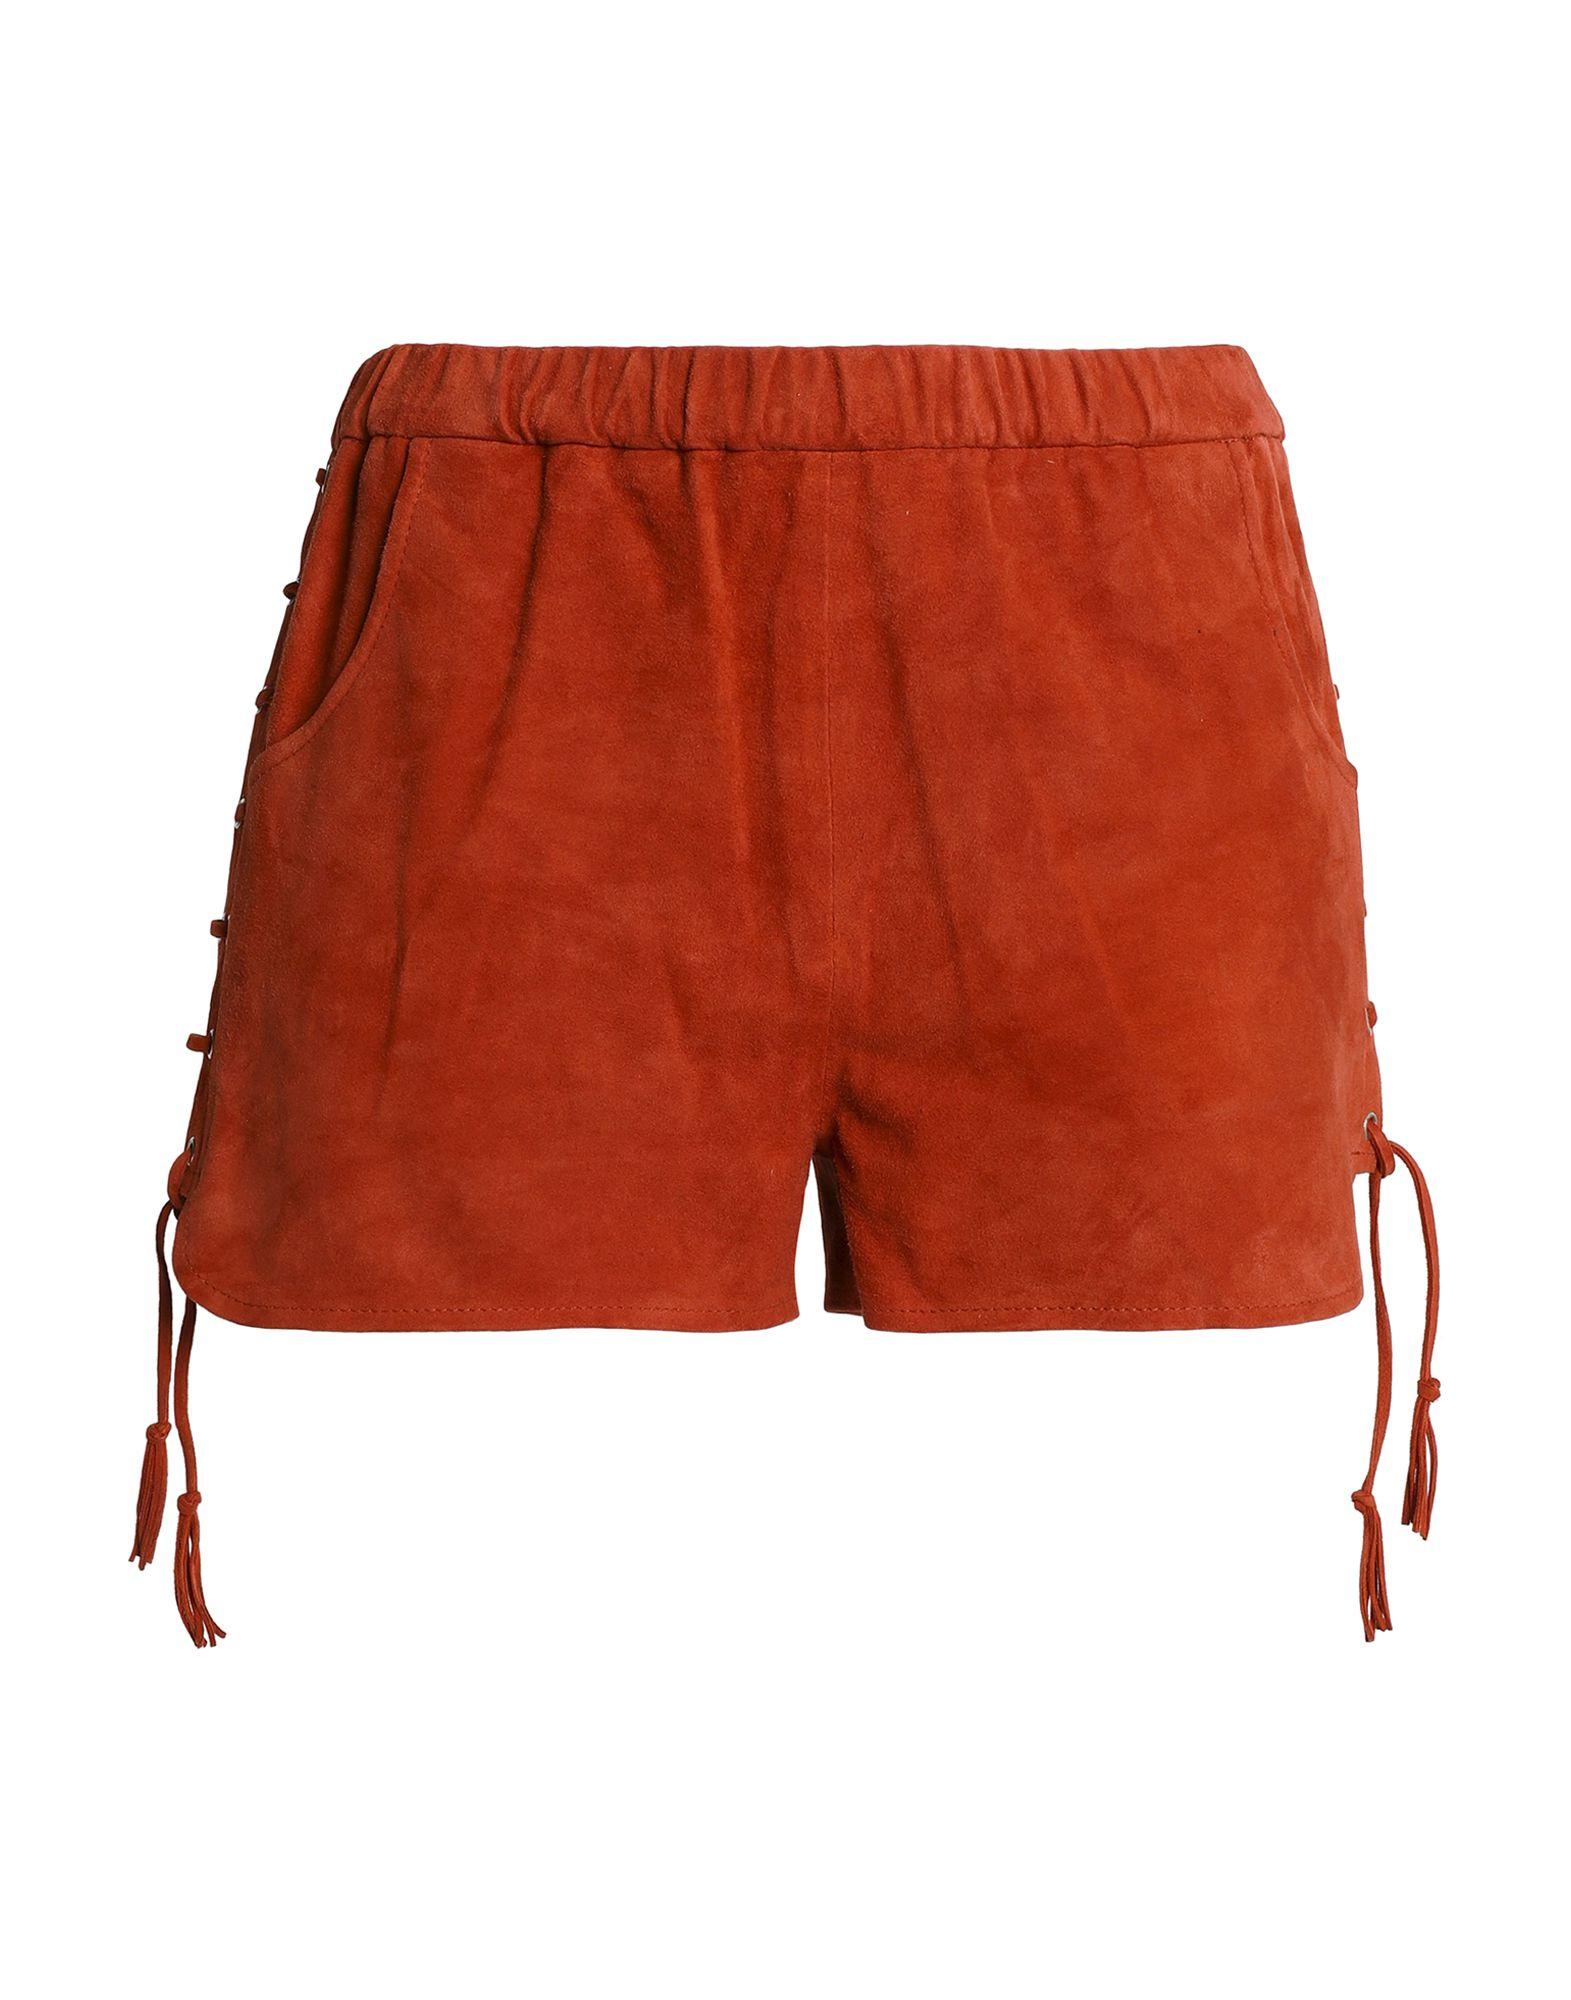 Shorts Shorts & Bermuda Maje donna - 13336032VO  After-Sale-Schutz